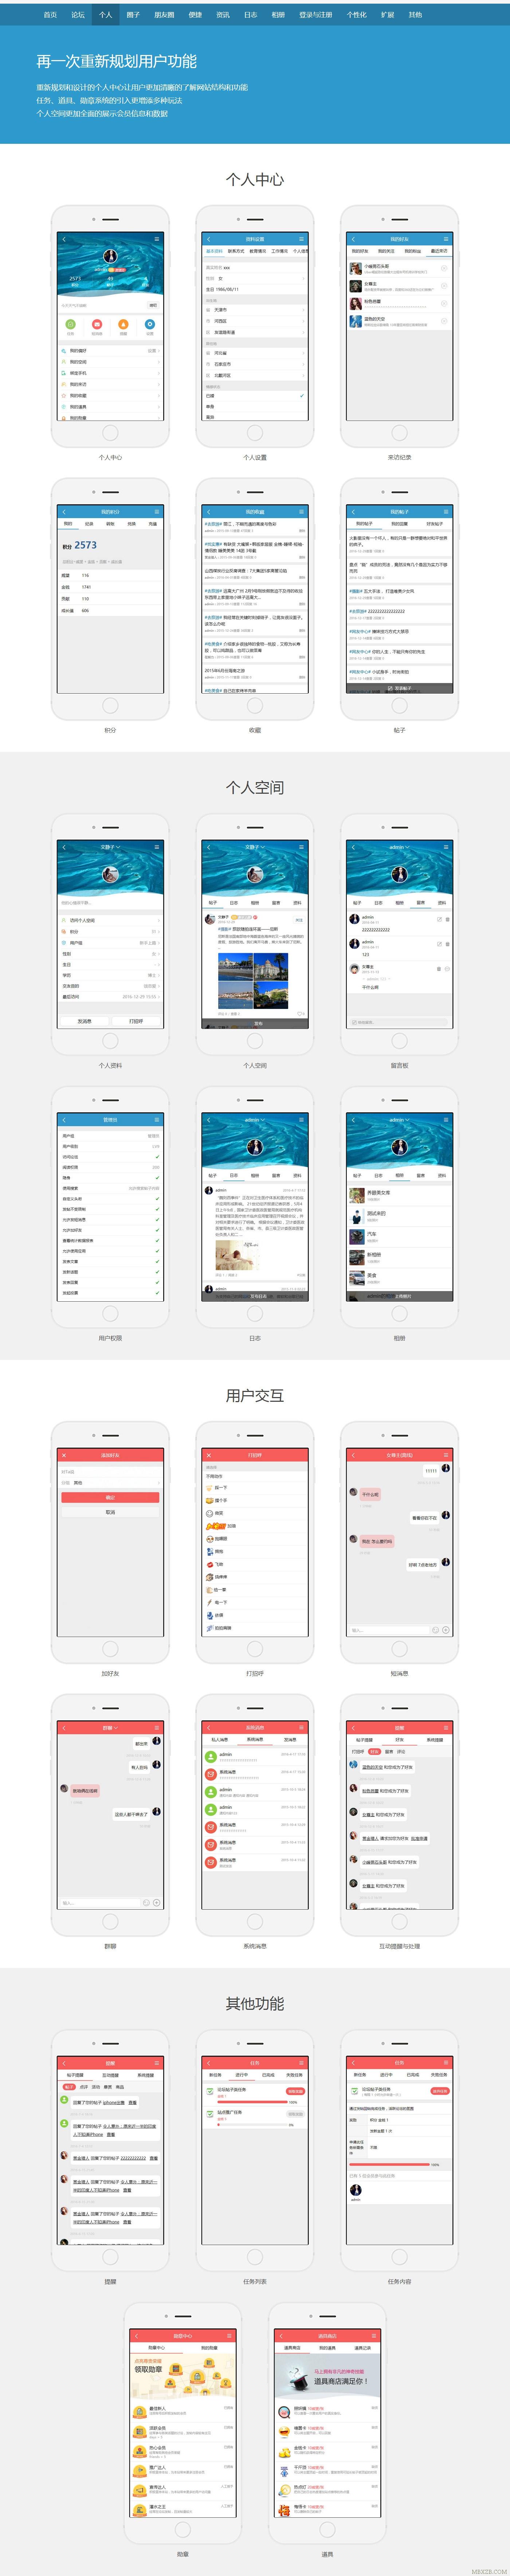 DISCUZ【价值12340元】APP!手机模板 Im Dream(immwa)全功能版3.12